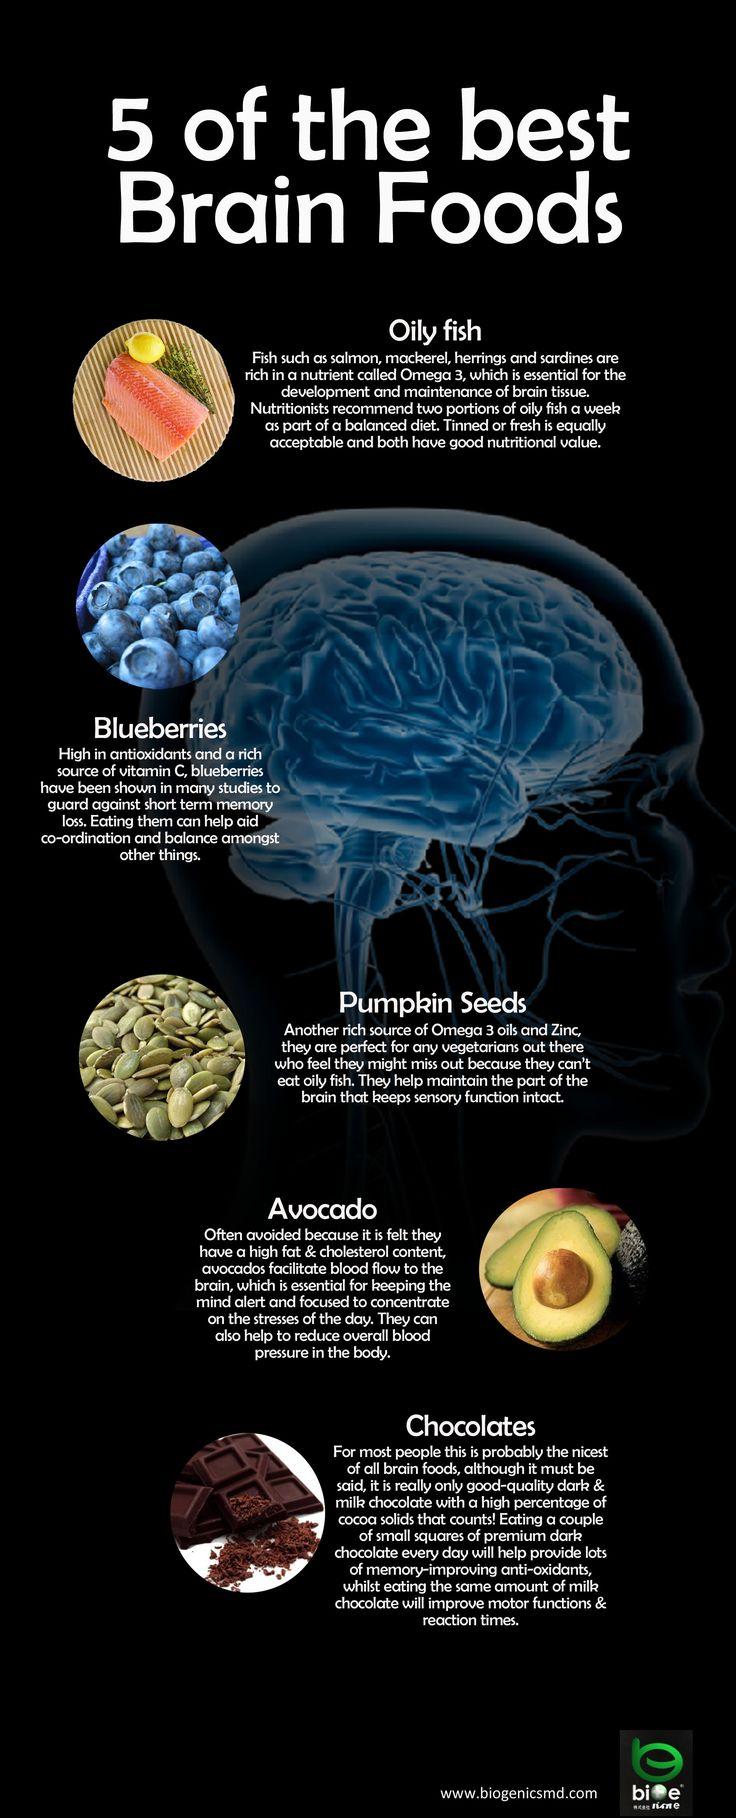 5 of the Best Brain Food